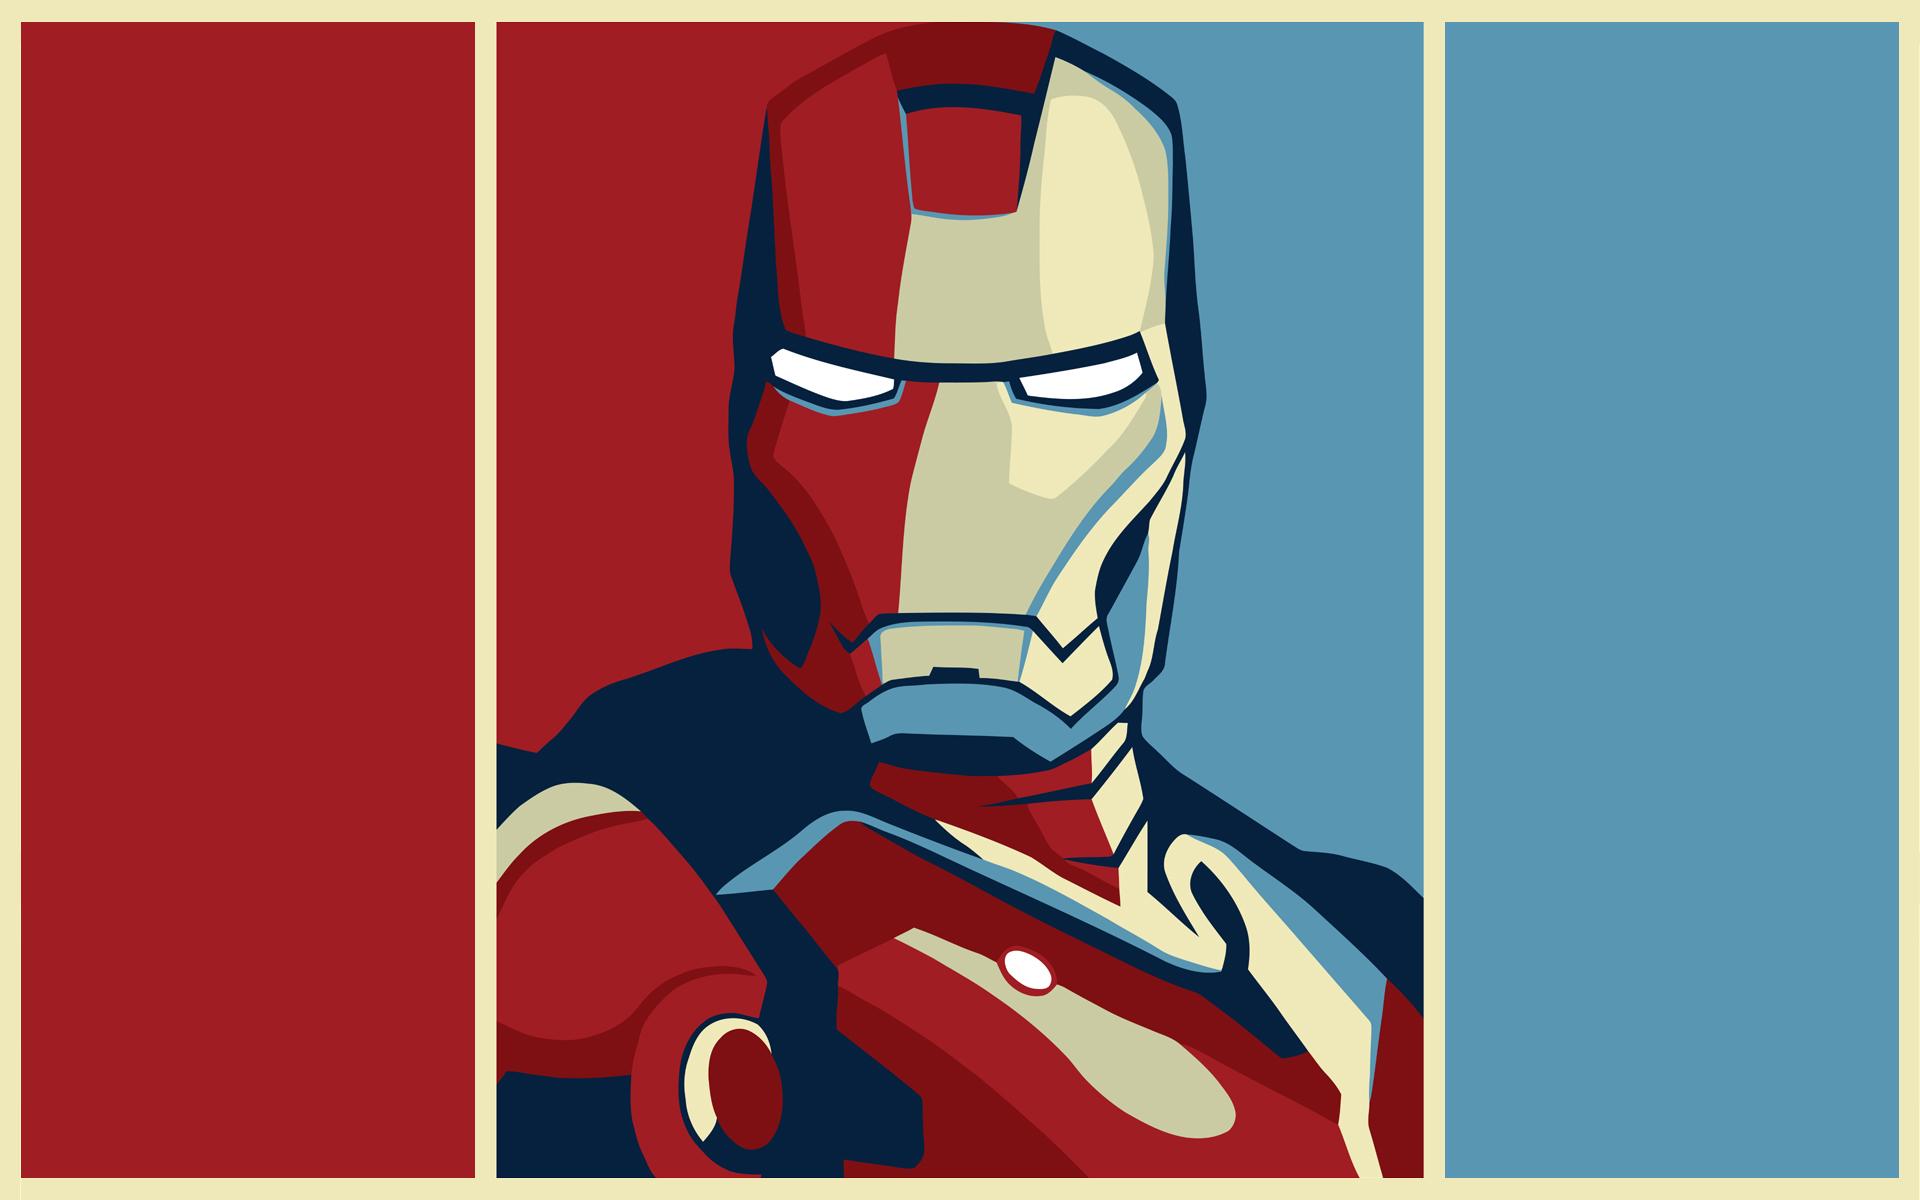 Dibujo de Iron Man - 1920x1200